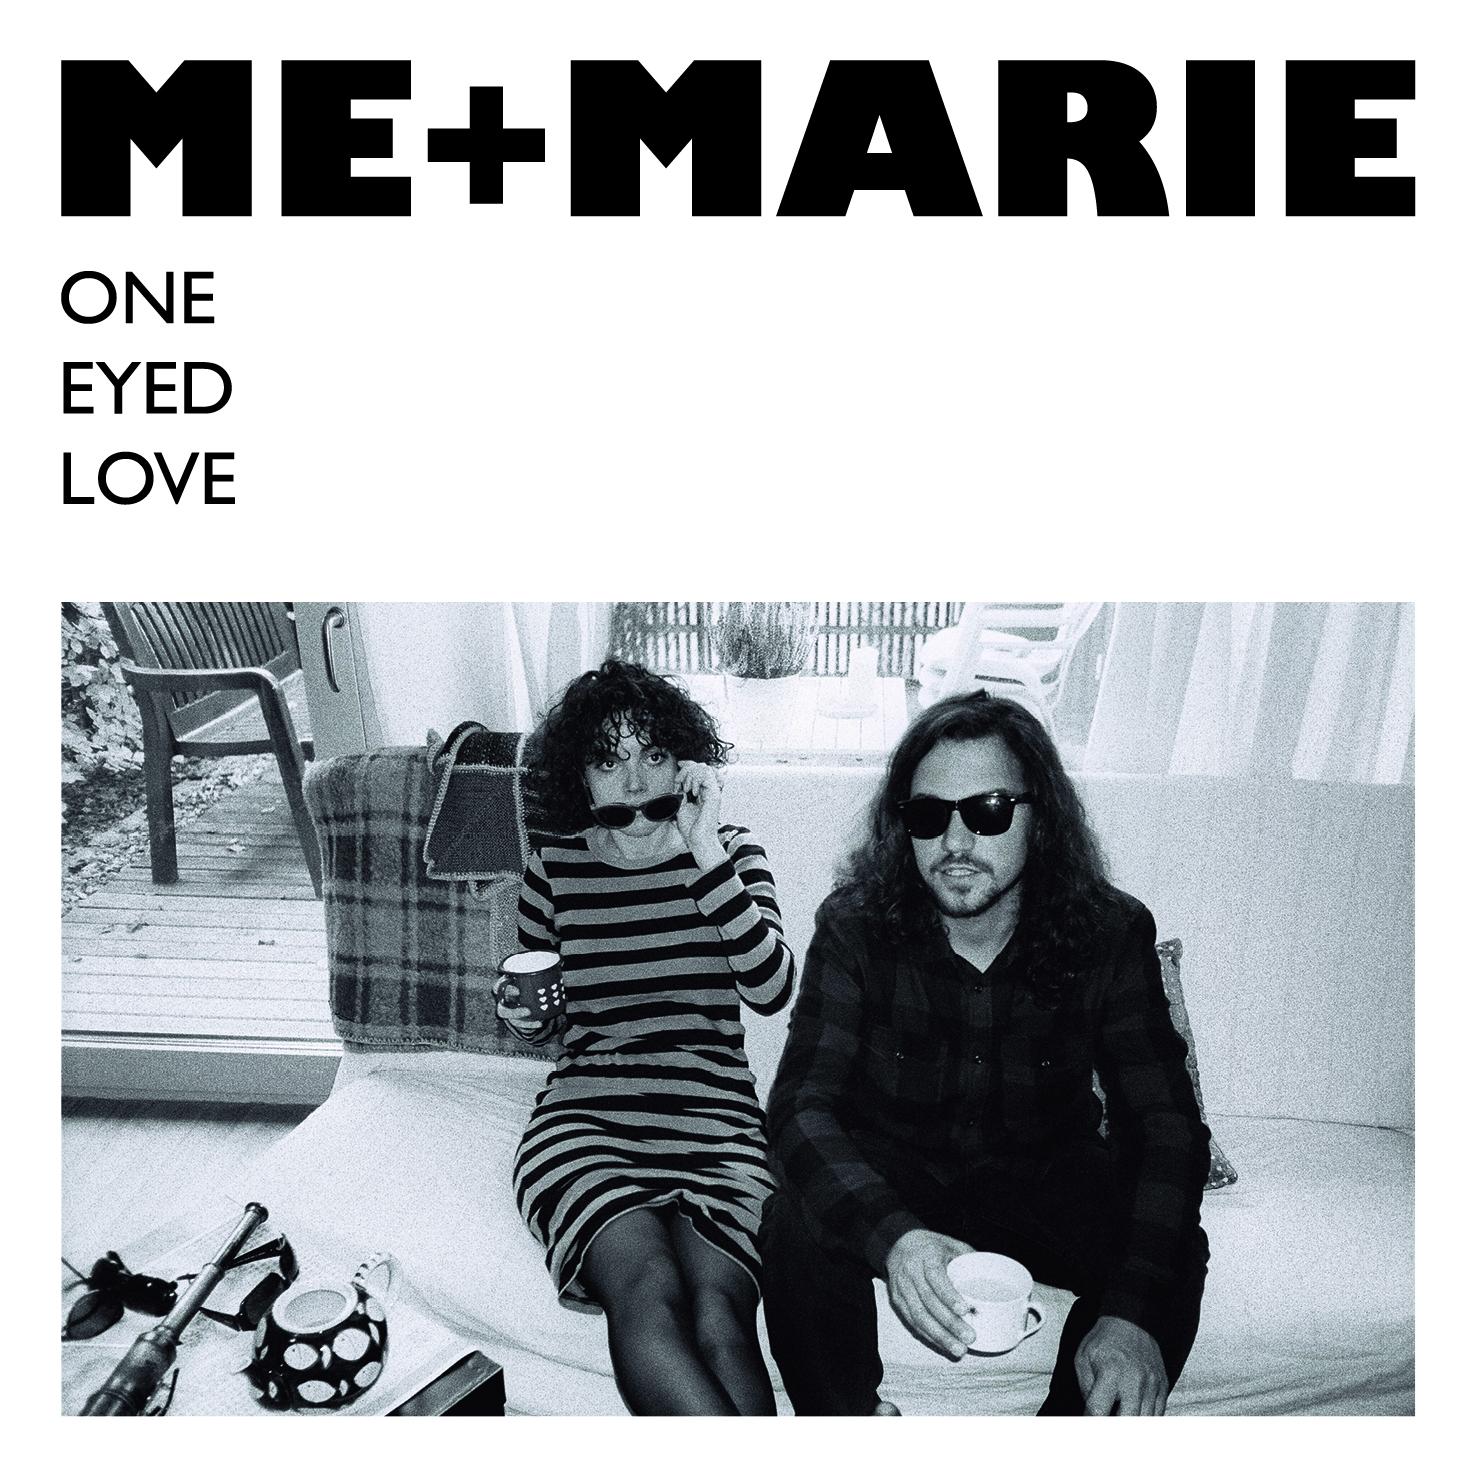 ME_+_MARIE One_Eyed_love albumcover_125x125_300dpi_cmyk_print